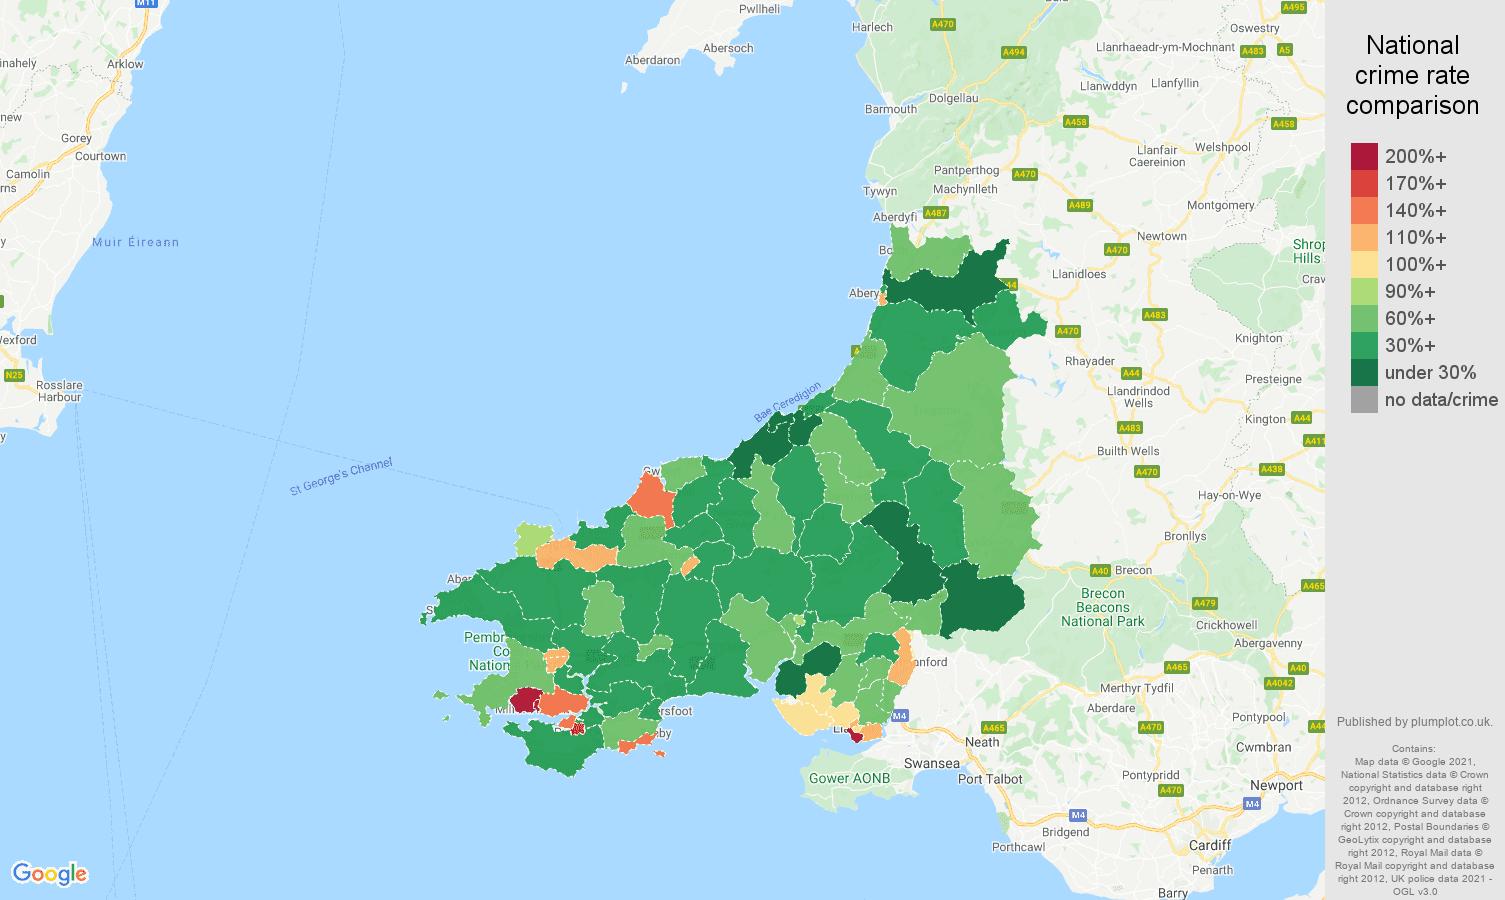 Dyfed criminal damage and arson crime rate comparison map